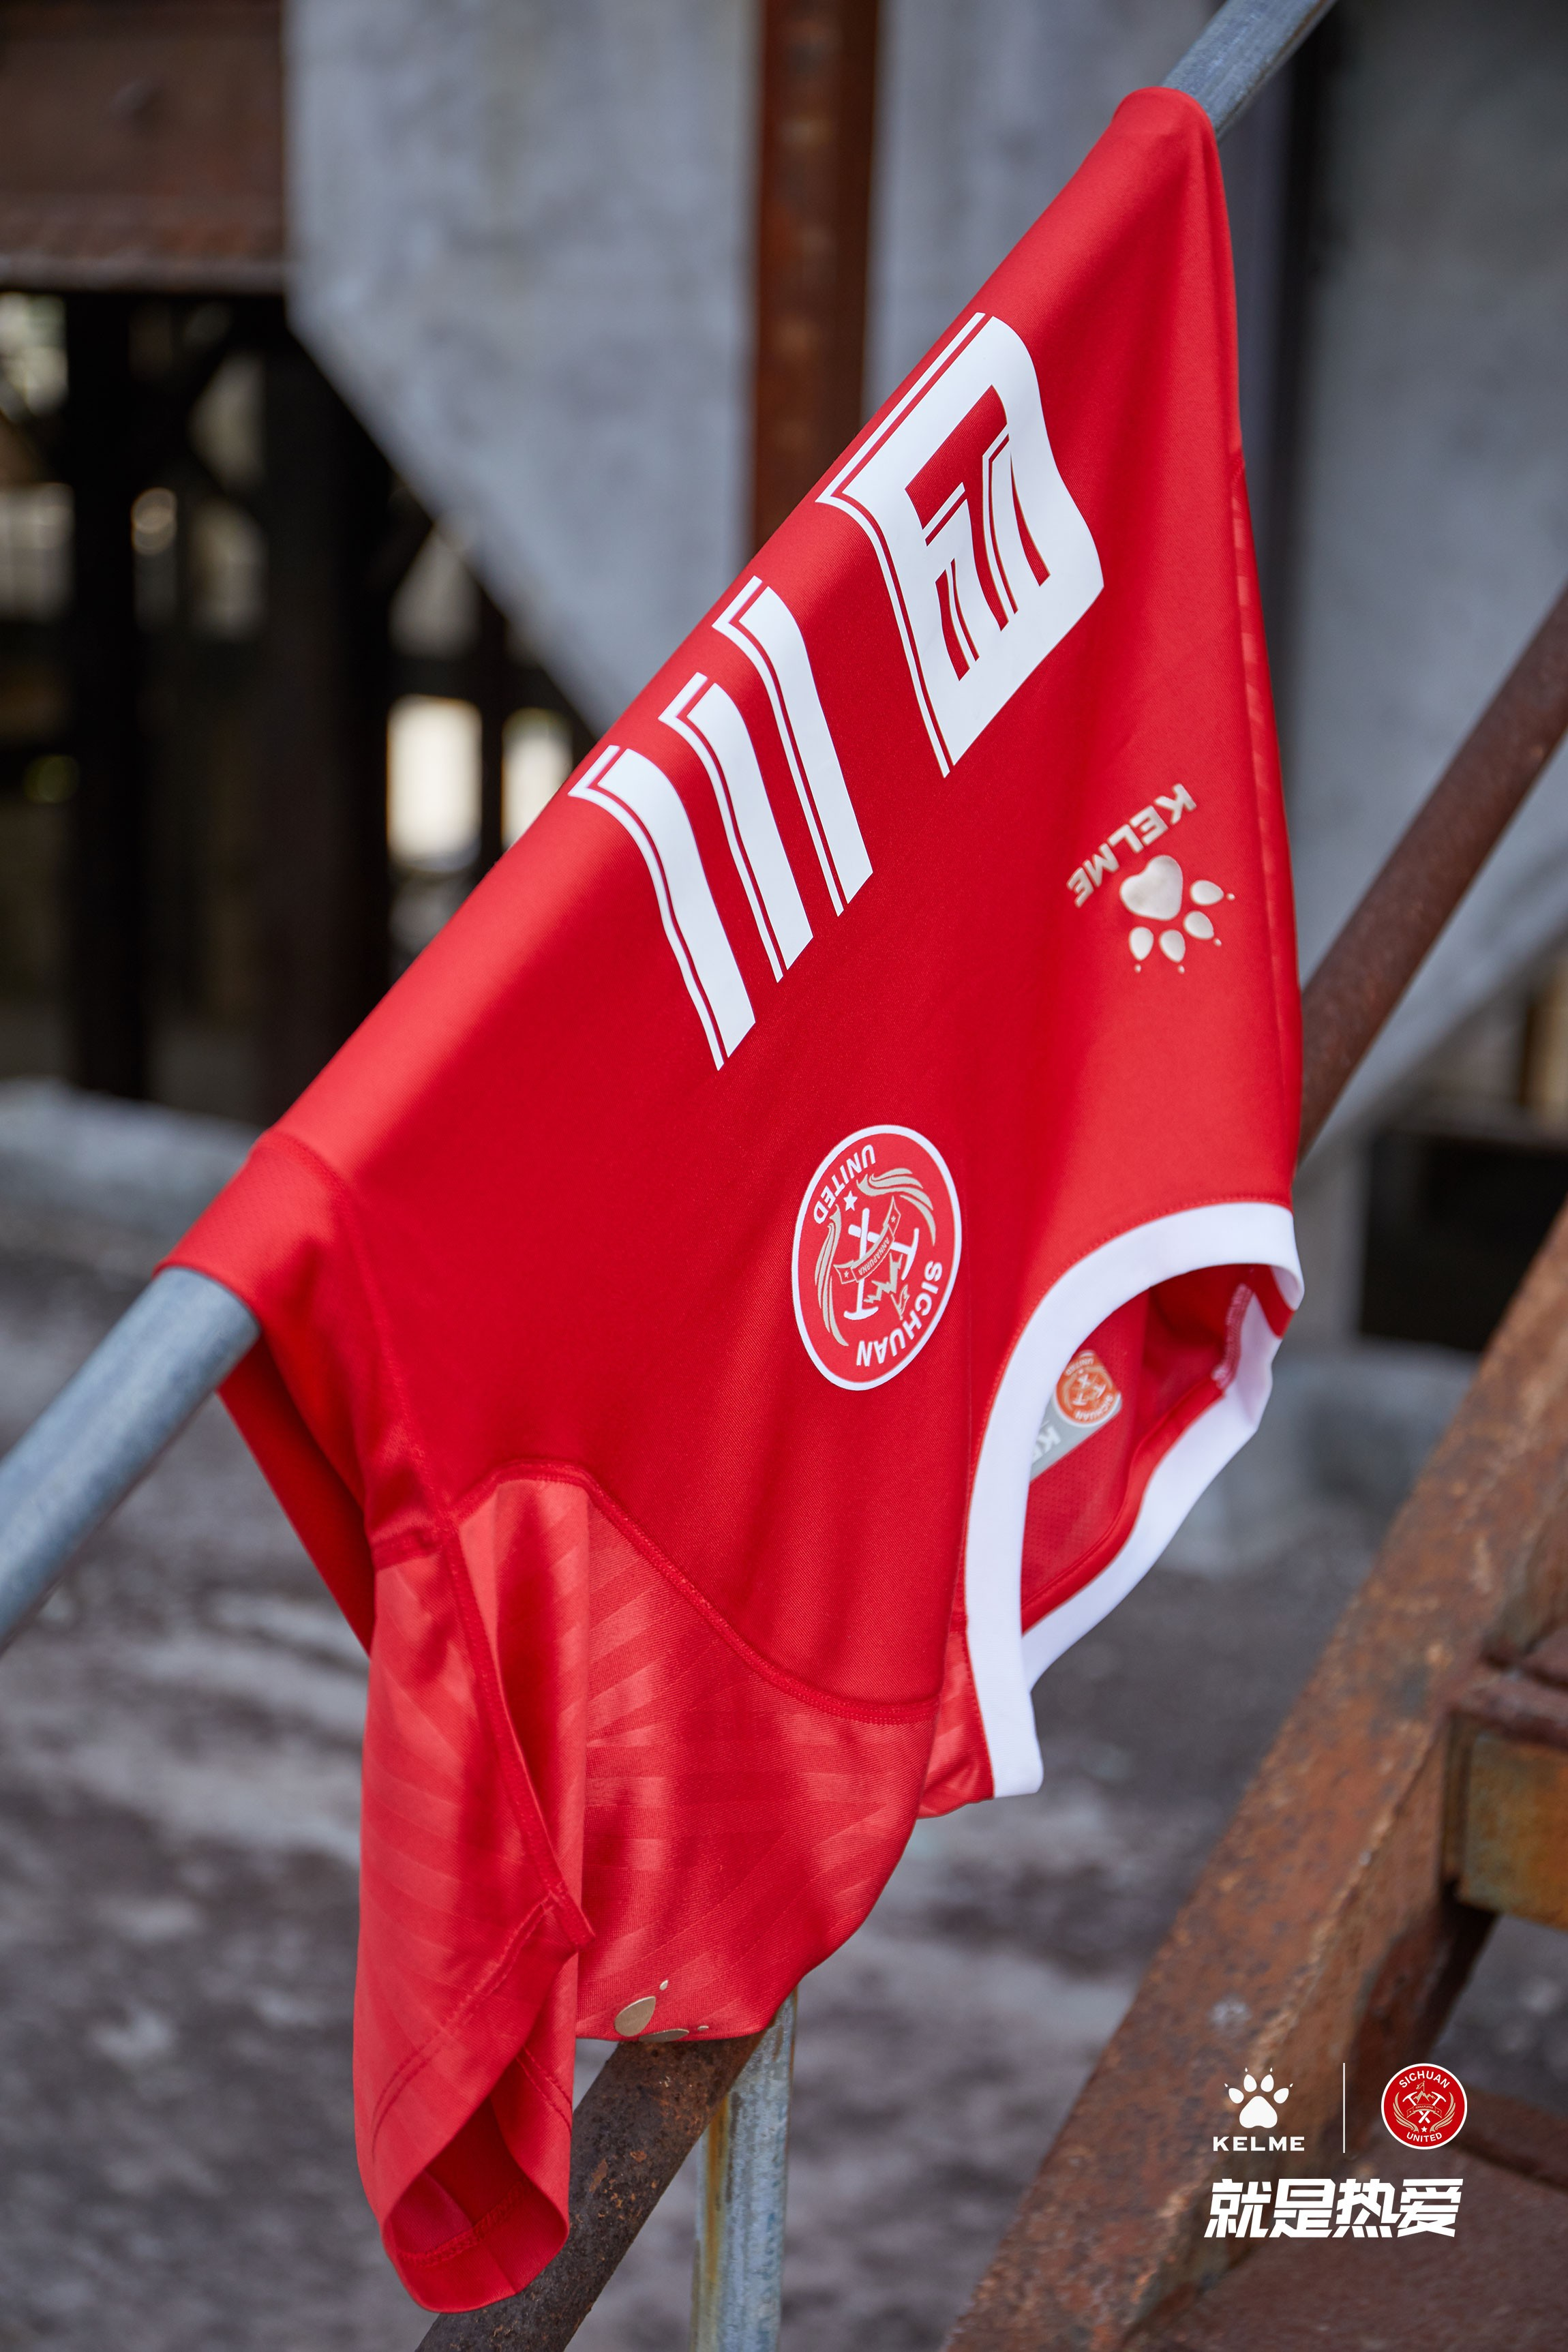 KELME携手四川安纳普尔那足球俱乐部发布新赛季战